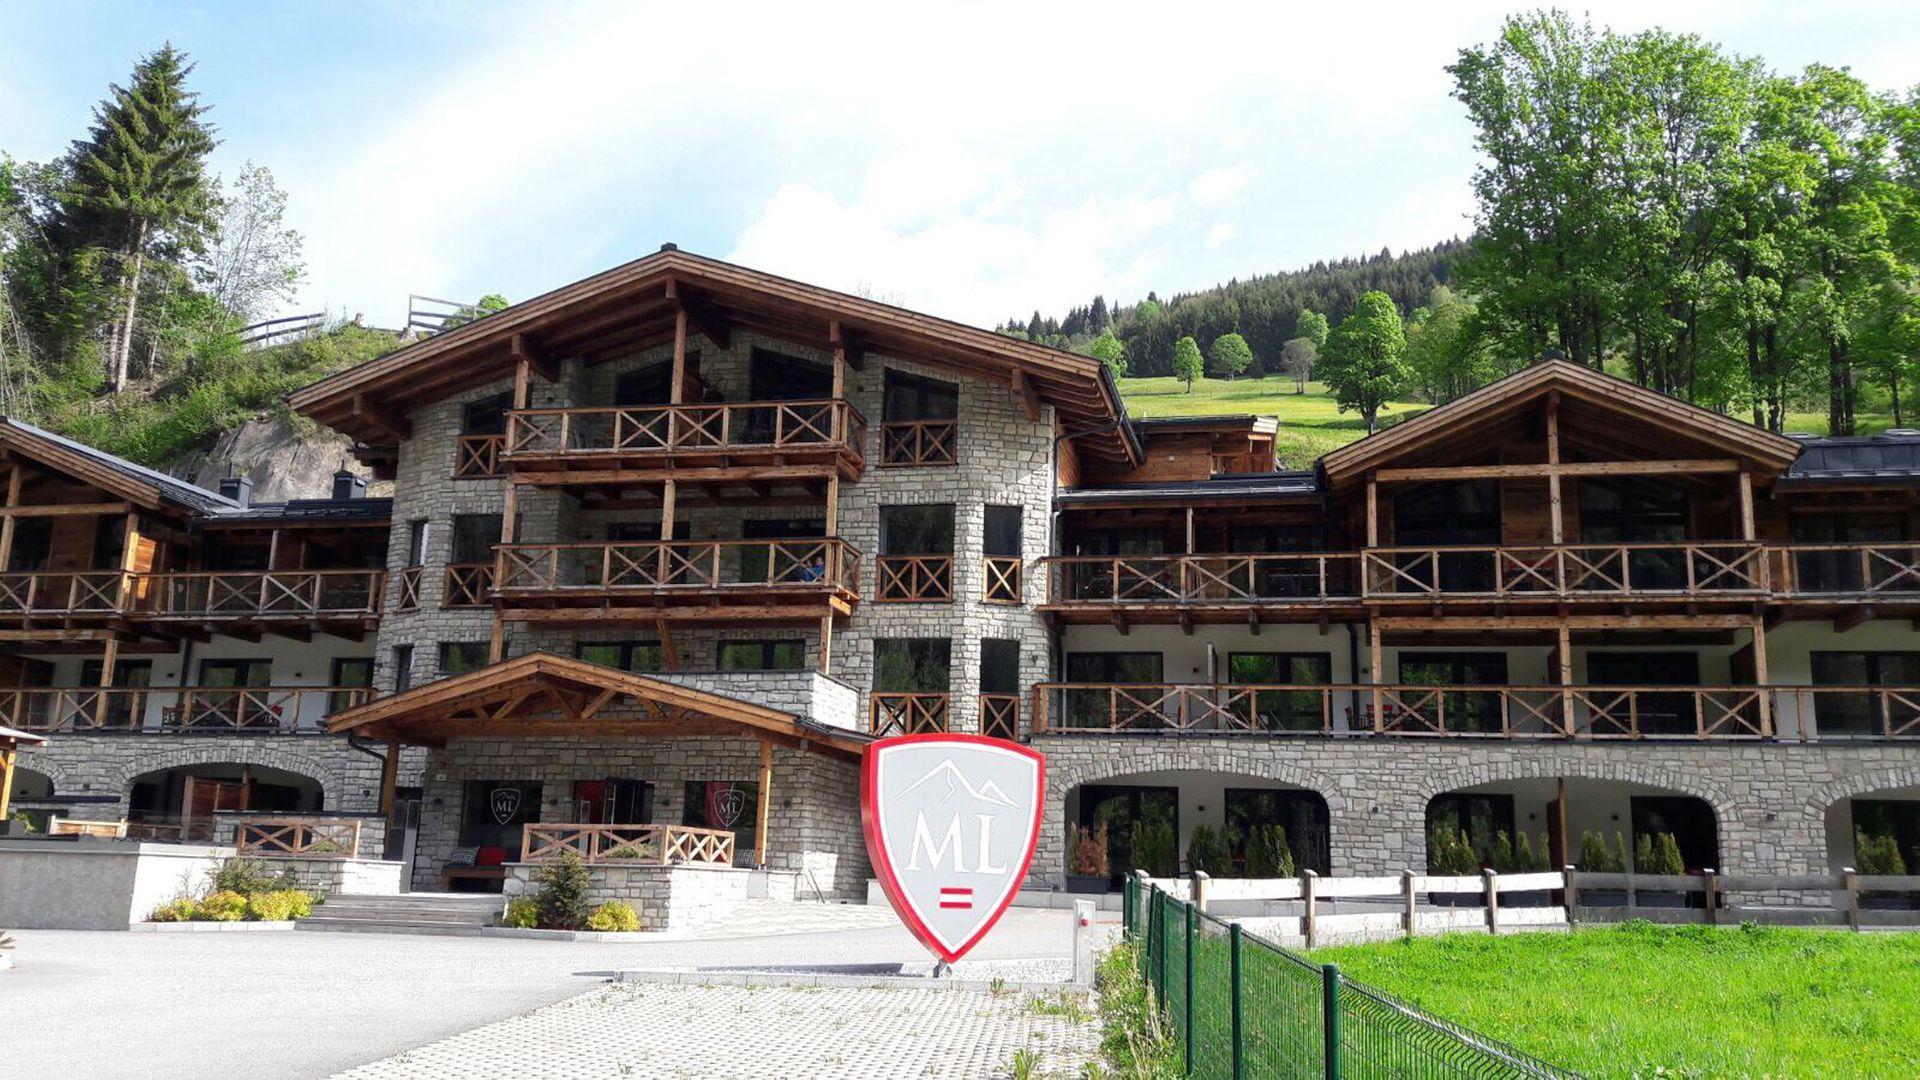 4* Avenida Mountain Lodges Saalbach